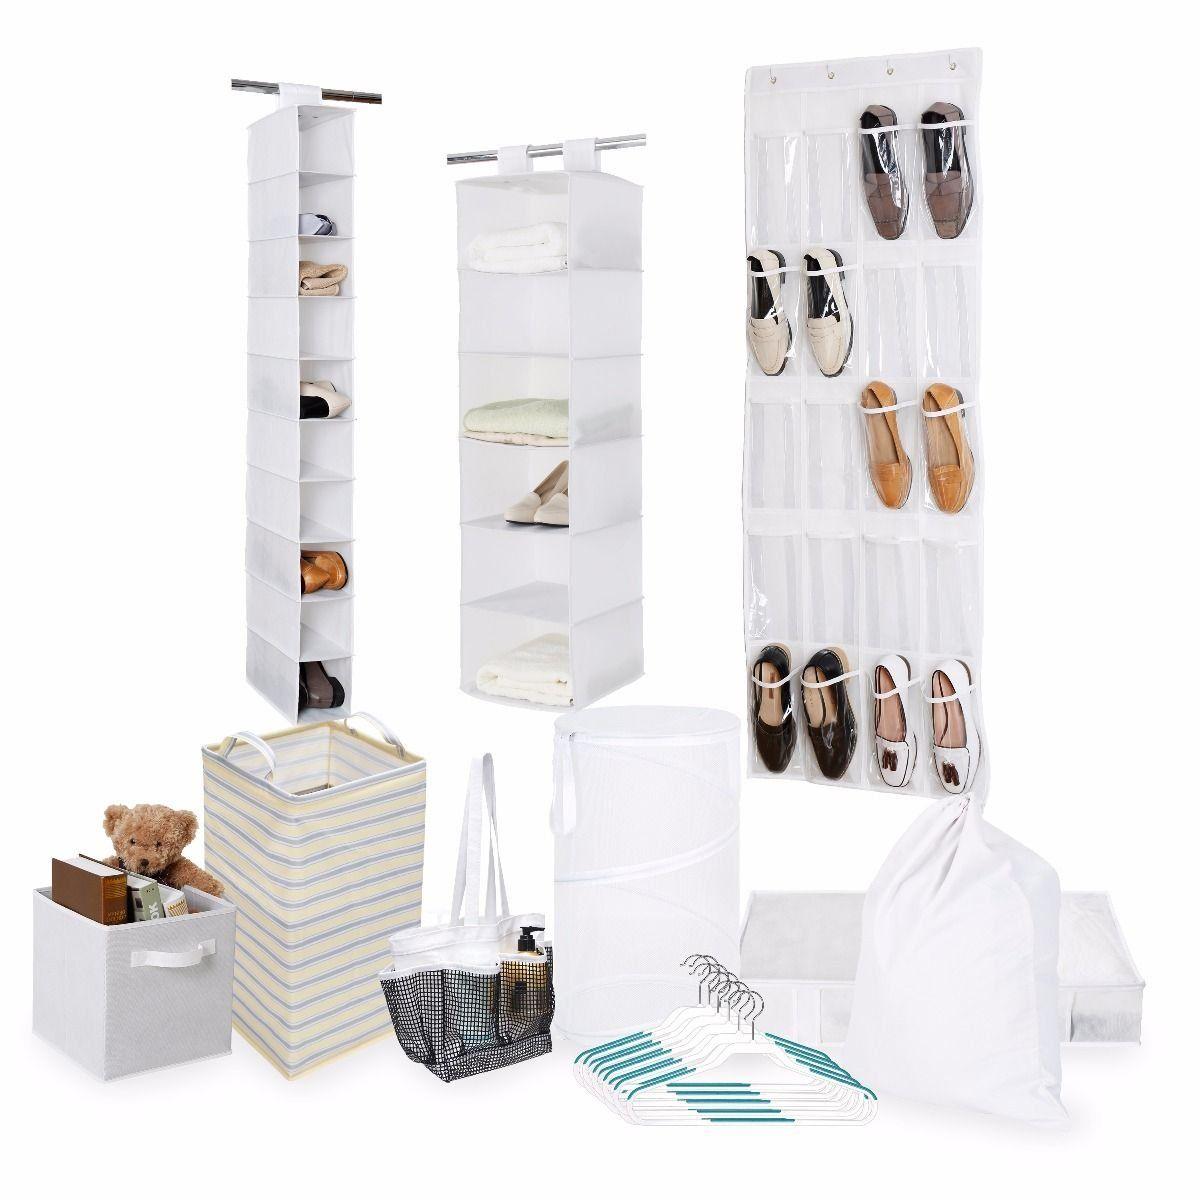 Tidy Living Bundle - Organization Storage Solution Set - Shower ...